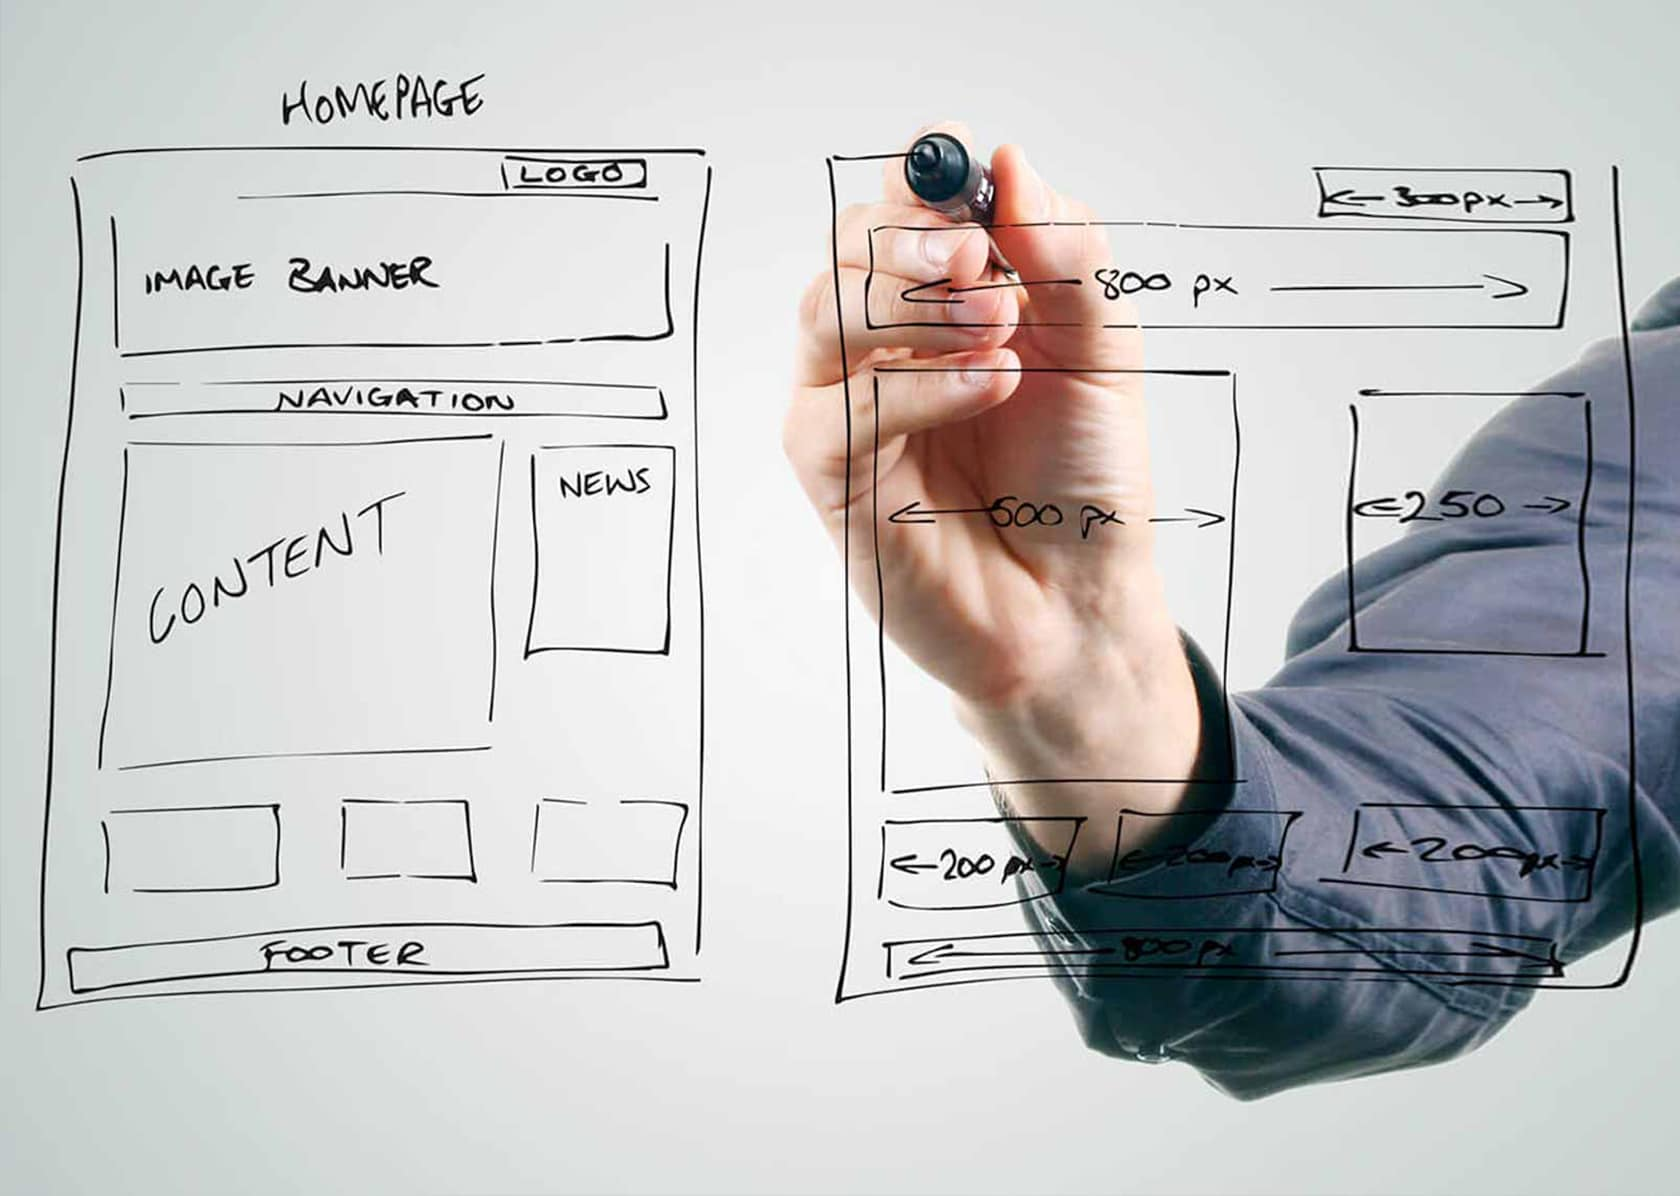 Diseño web - Mockups y wireframes